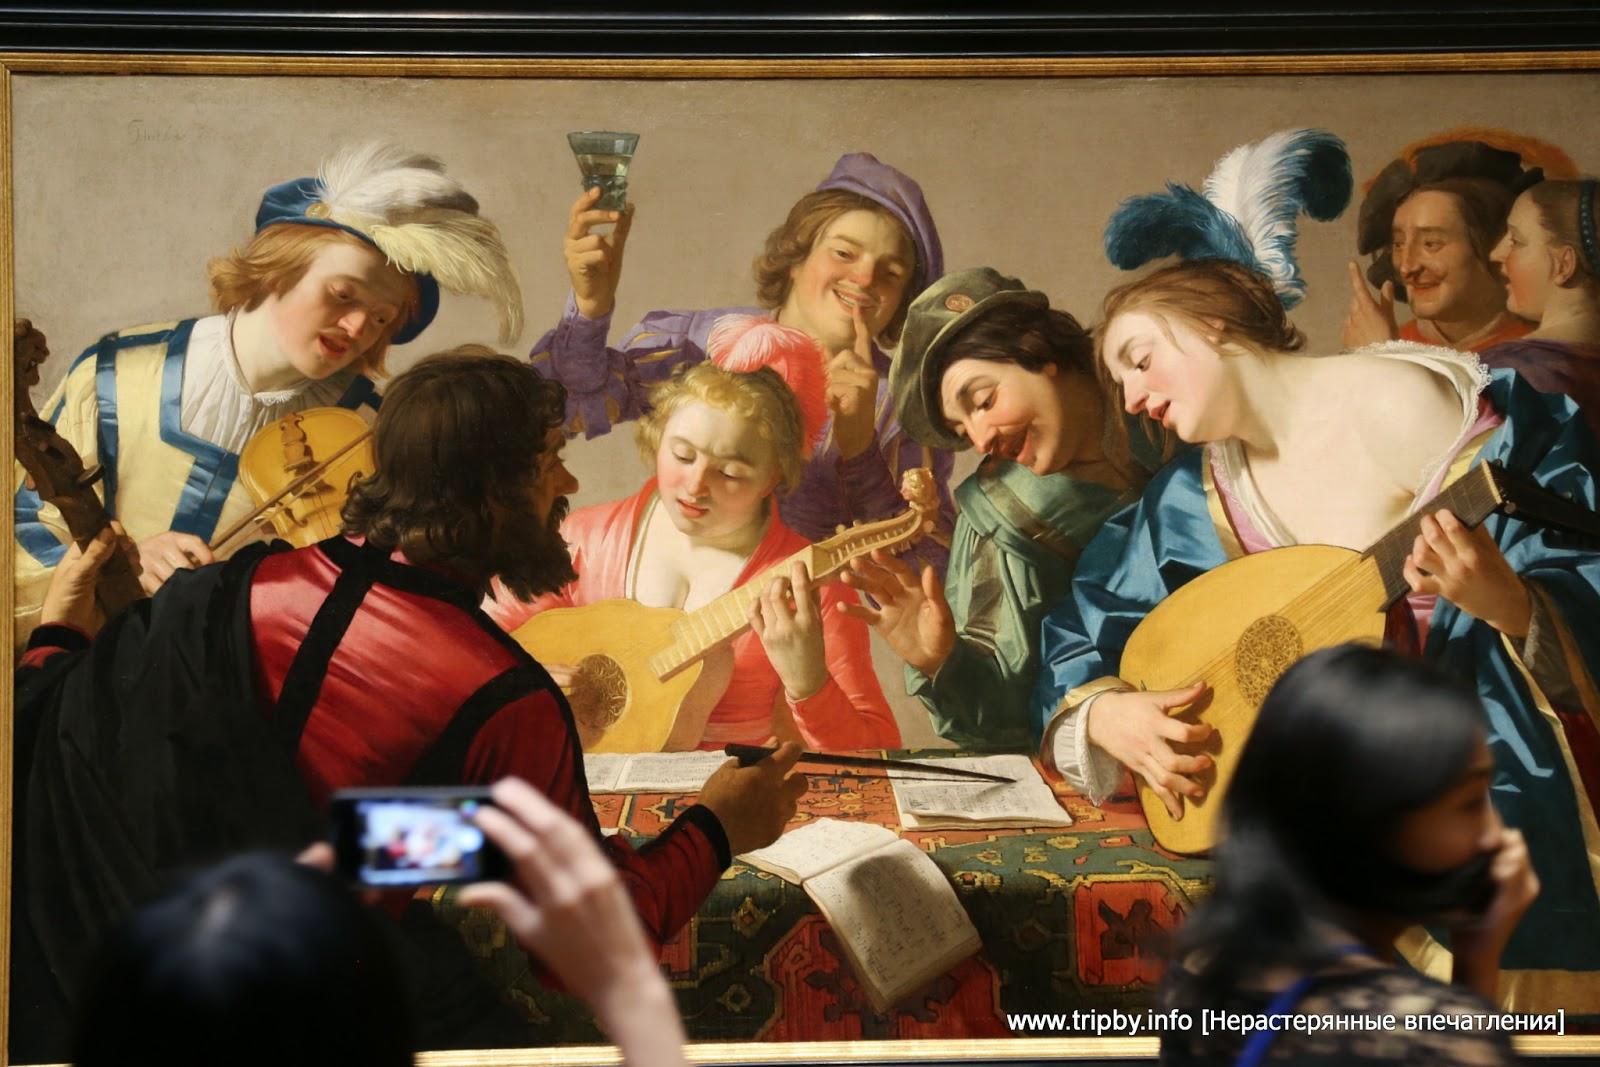 Honthorst, Gerrit van Dutch, 1590 - 1656 The Concert 1623